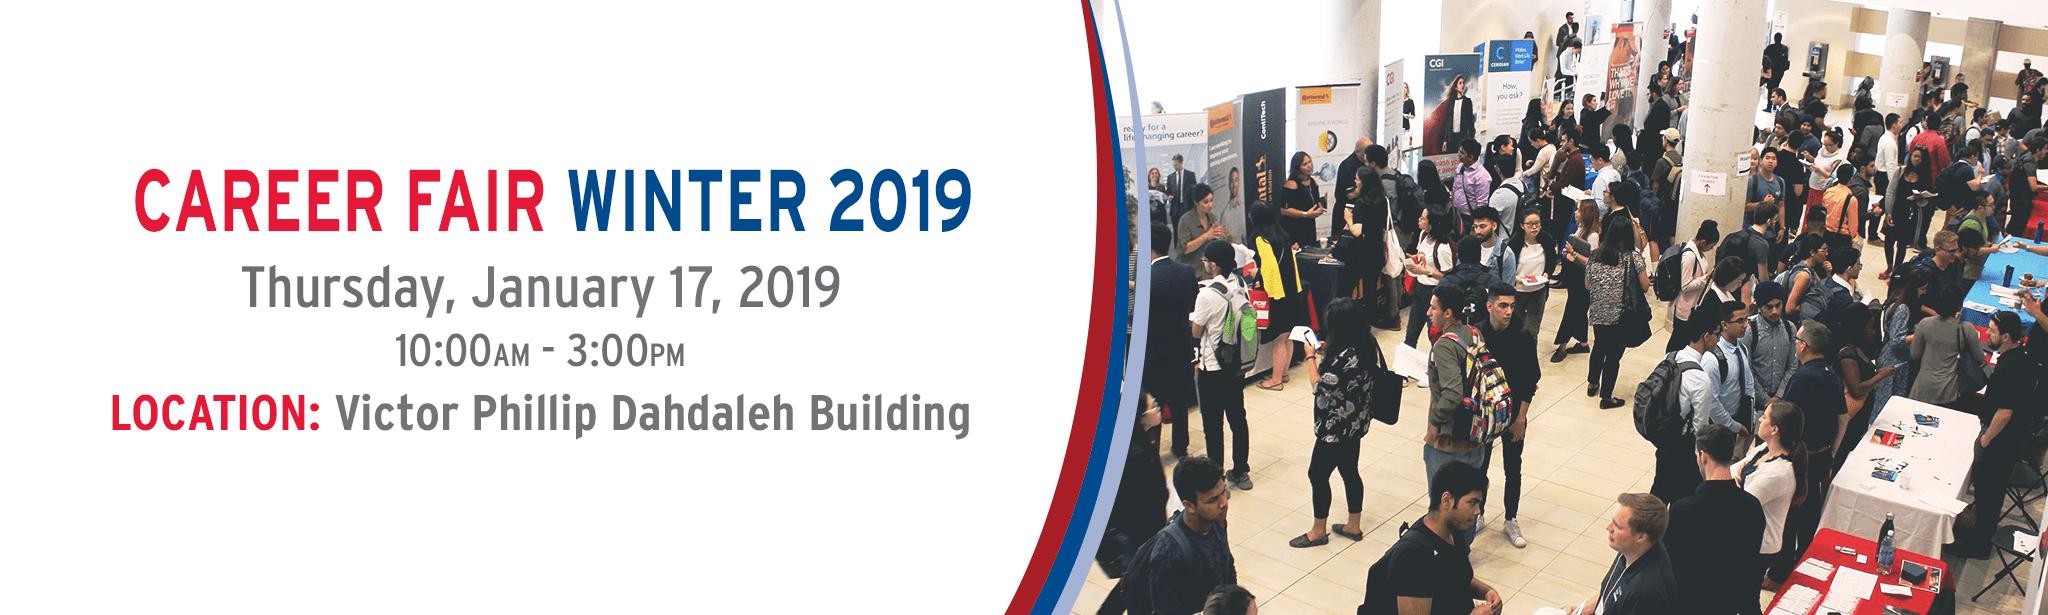 Winter Career Fair Jan 17, 2019 10am -3pm Victor Phillip Dahdaleh Building